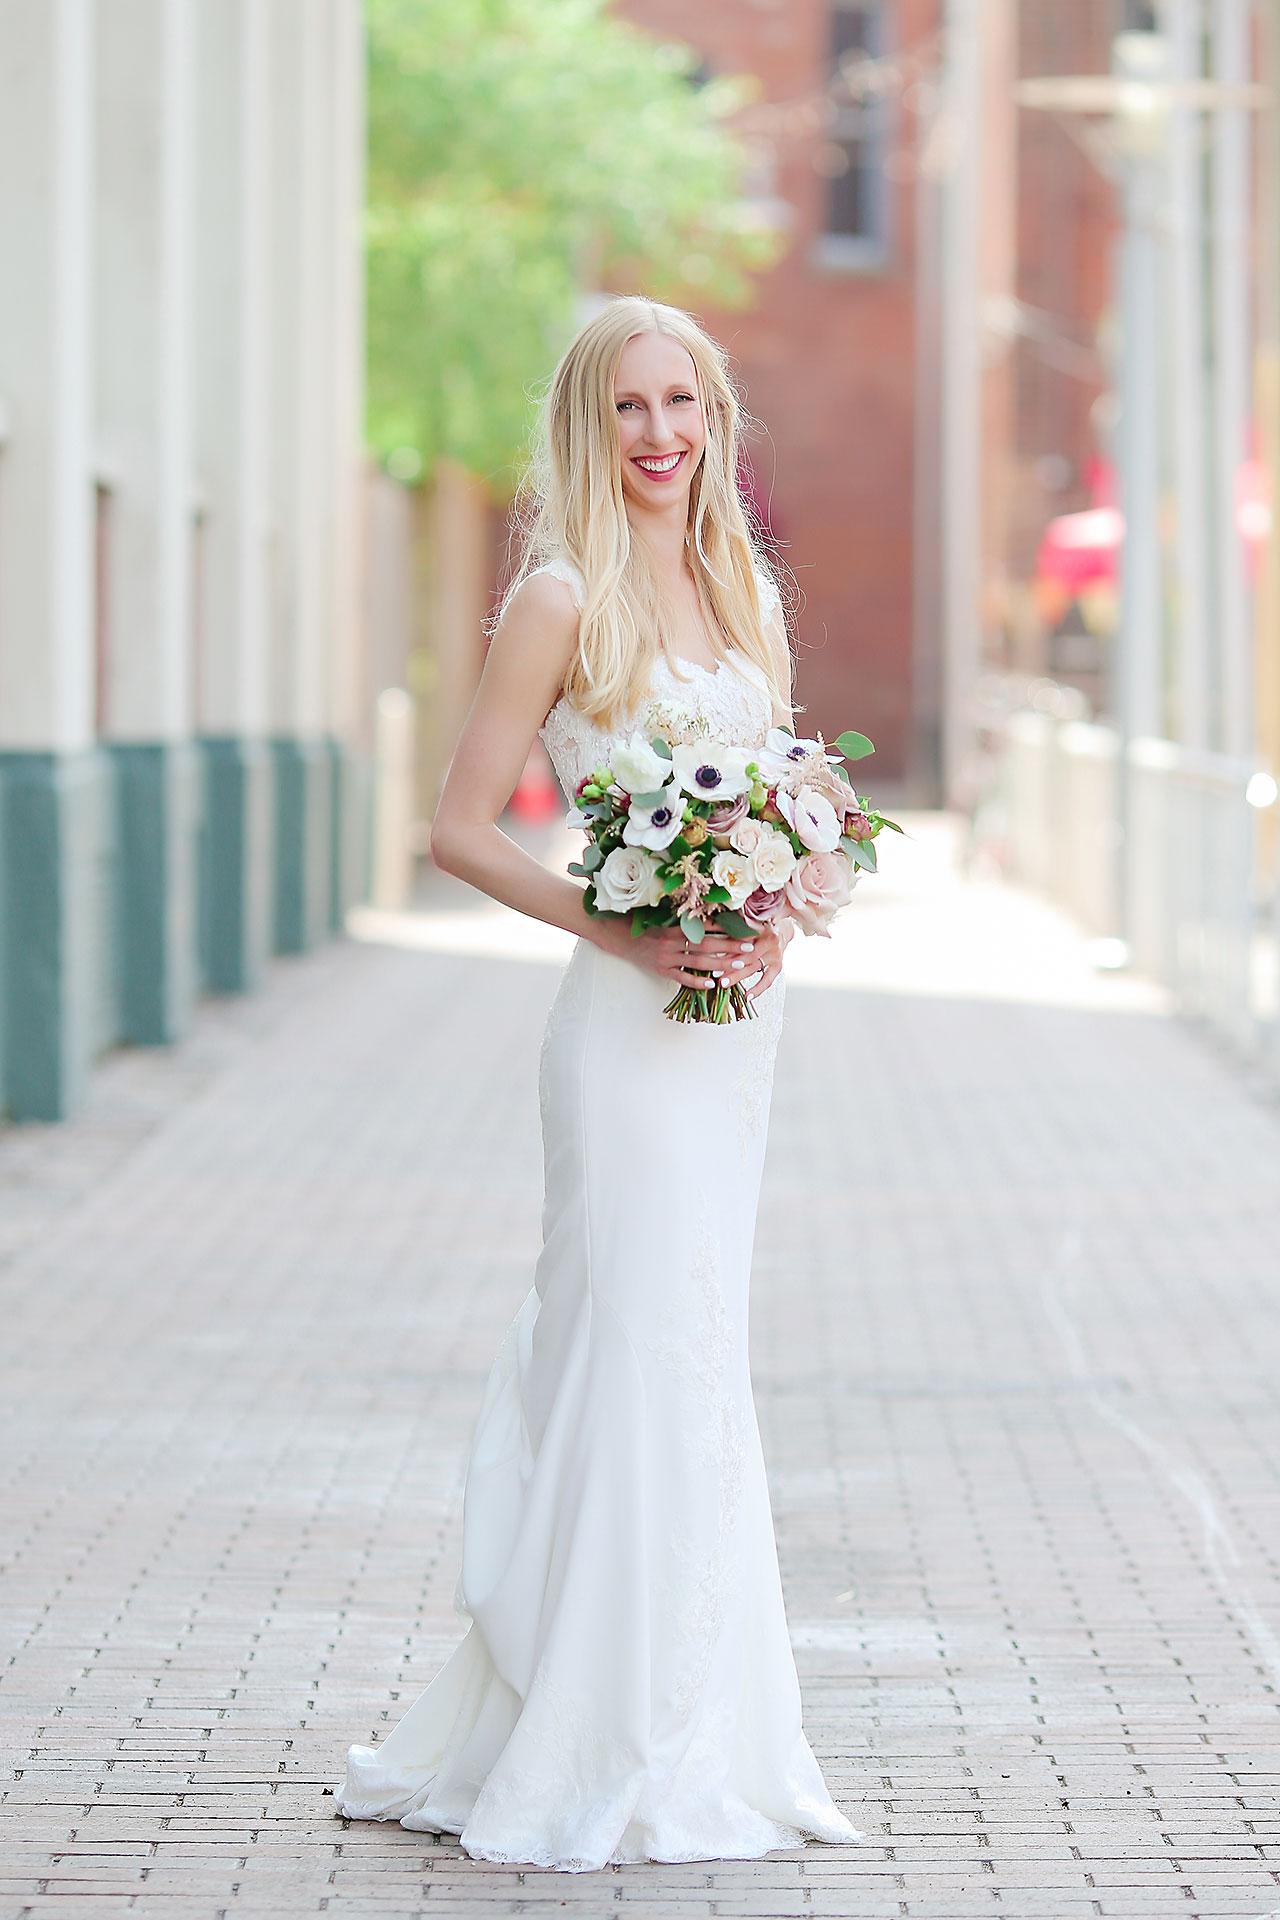 Molly Declan Scottish Rite Indianapolis Wedding 061